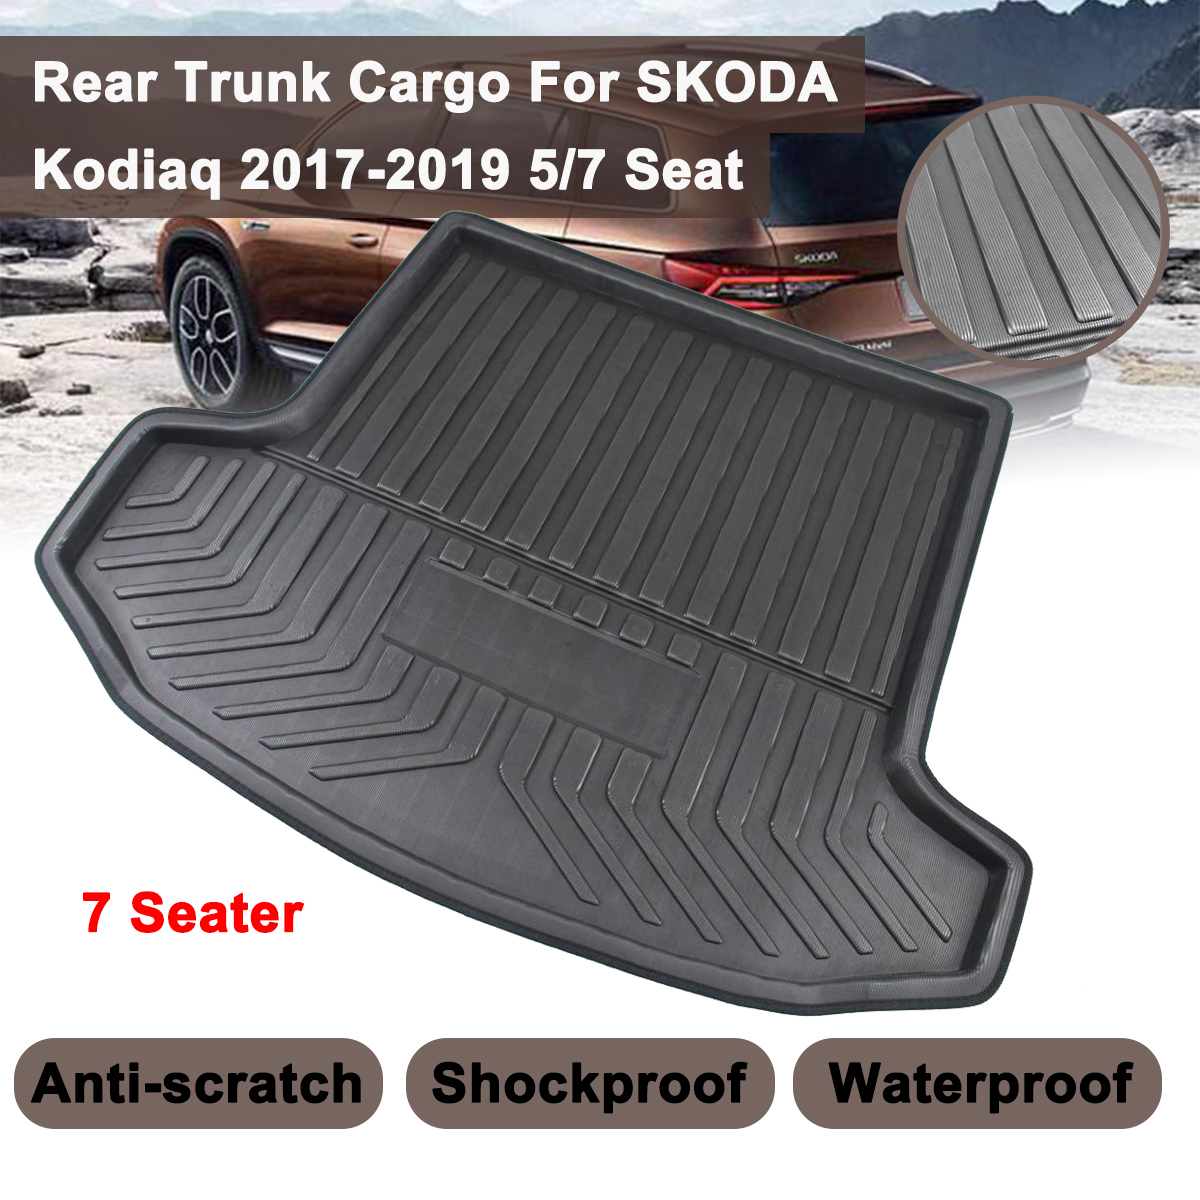 Car Boot Mat Boot Cover Car Mat Carpet Cargo Liner Cargo Cover Cargo Mat Trunk Liner Tray Floor Mat Cargo Liner for Qashqai 2008 2009 2010 2011 2012 2013 2014 2015 2016 2017 2018 2019